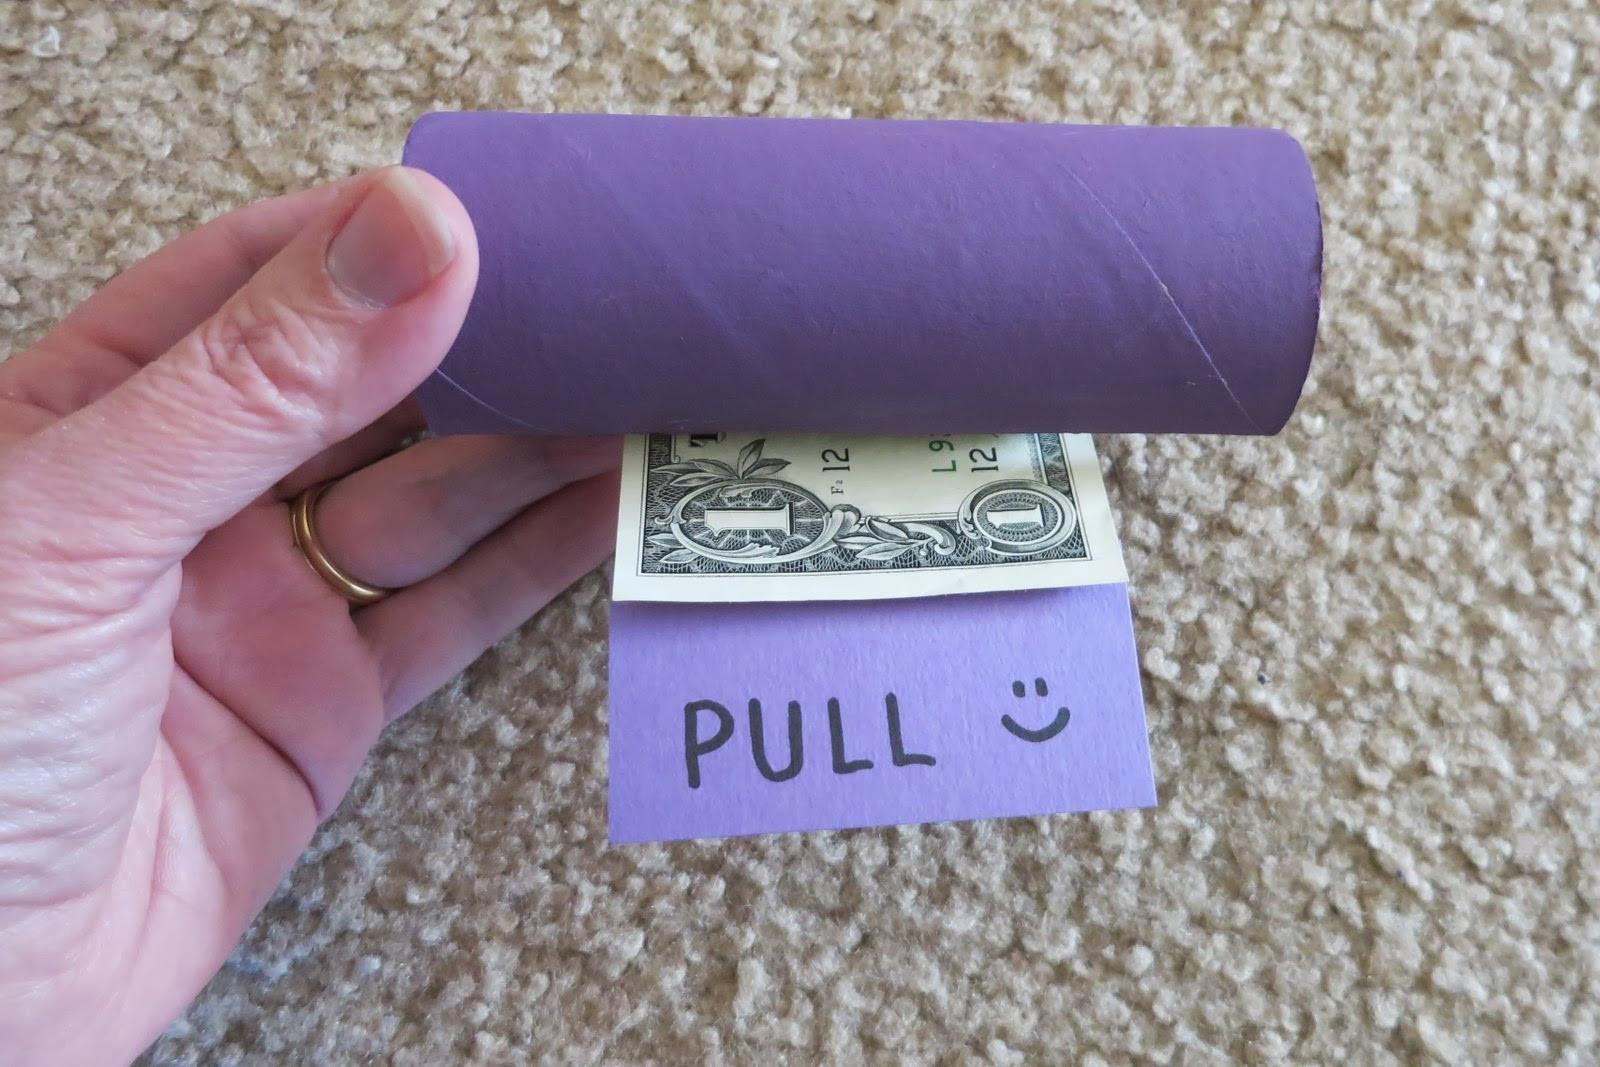 Best ideas about Dollar Bill Gift Ideas . Save or Pin Cindy deRosier My Creative Life Dollar Bill Dispenser Now.